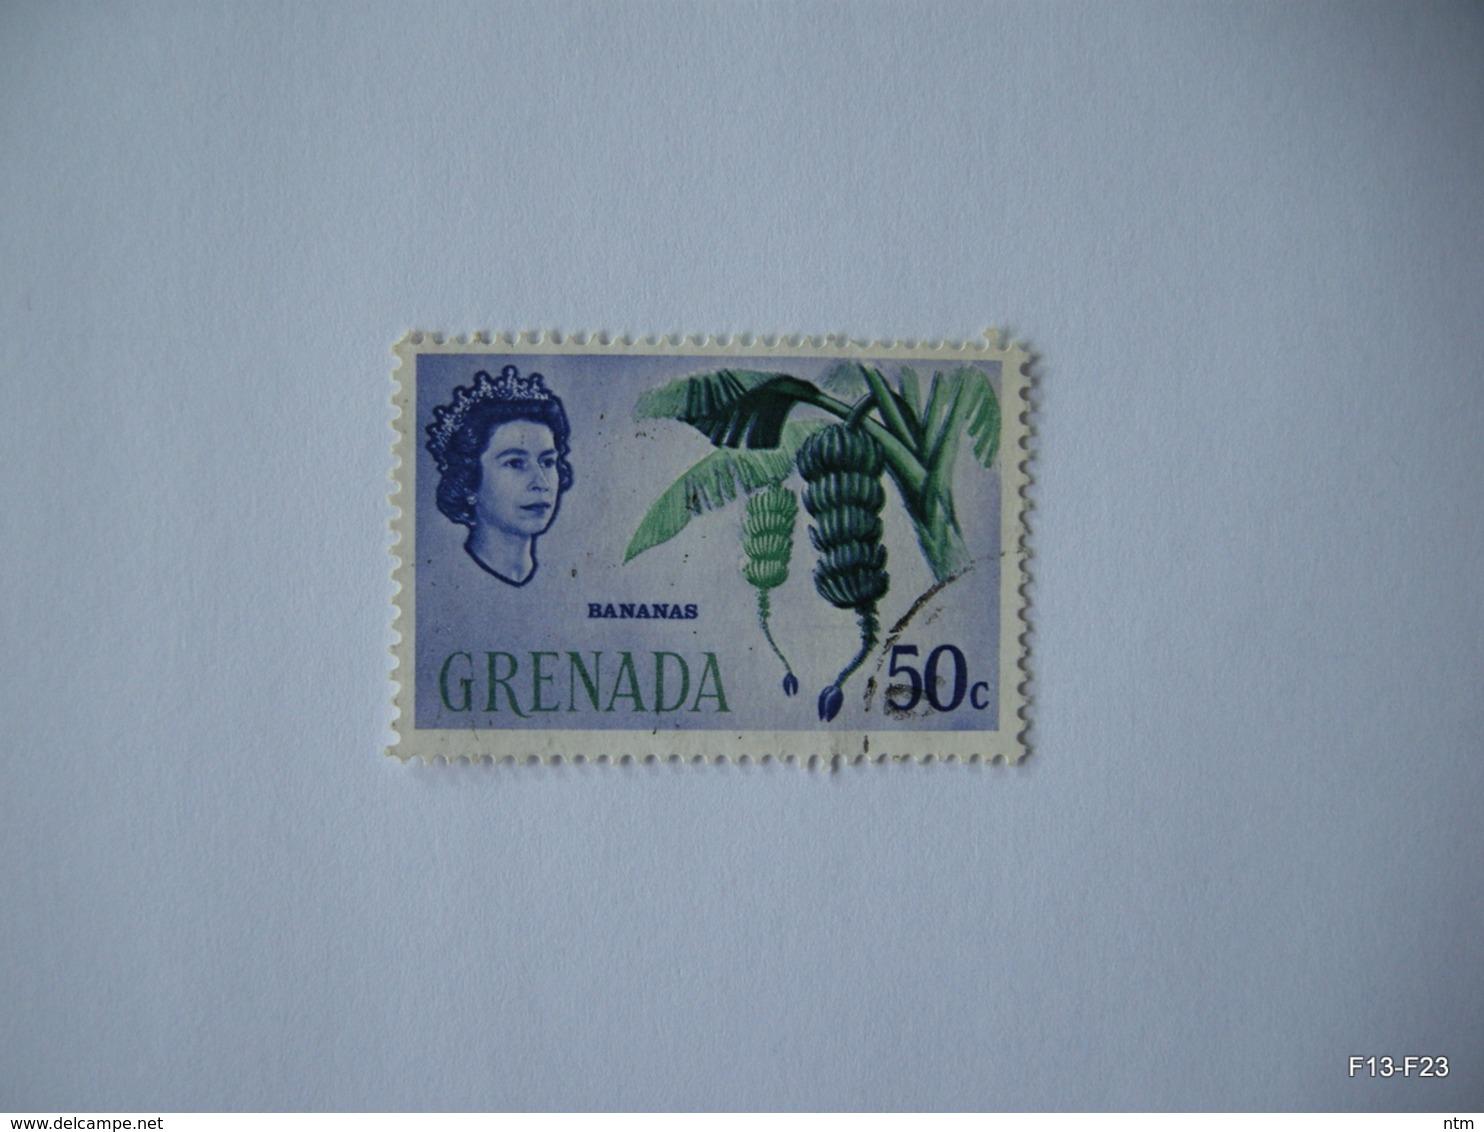 GRENADA 1966. Bananas. 50c. SG 242. Used. - Grenade (...-1974)